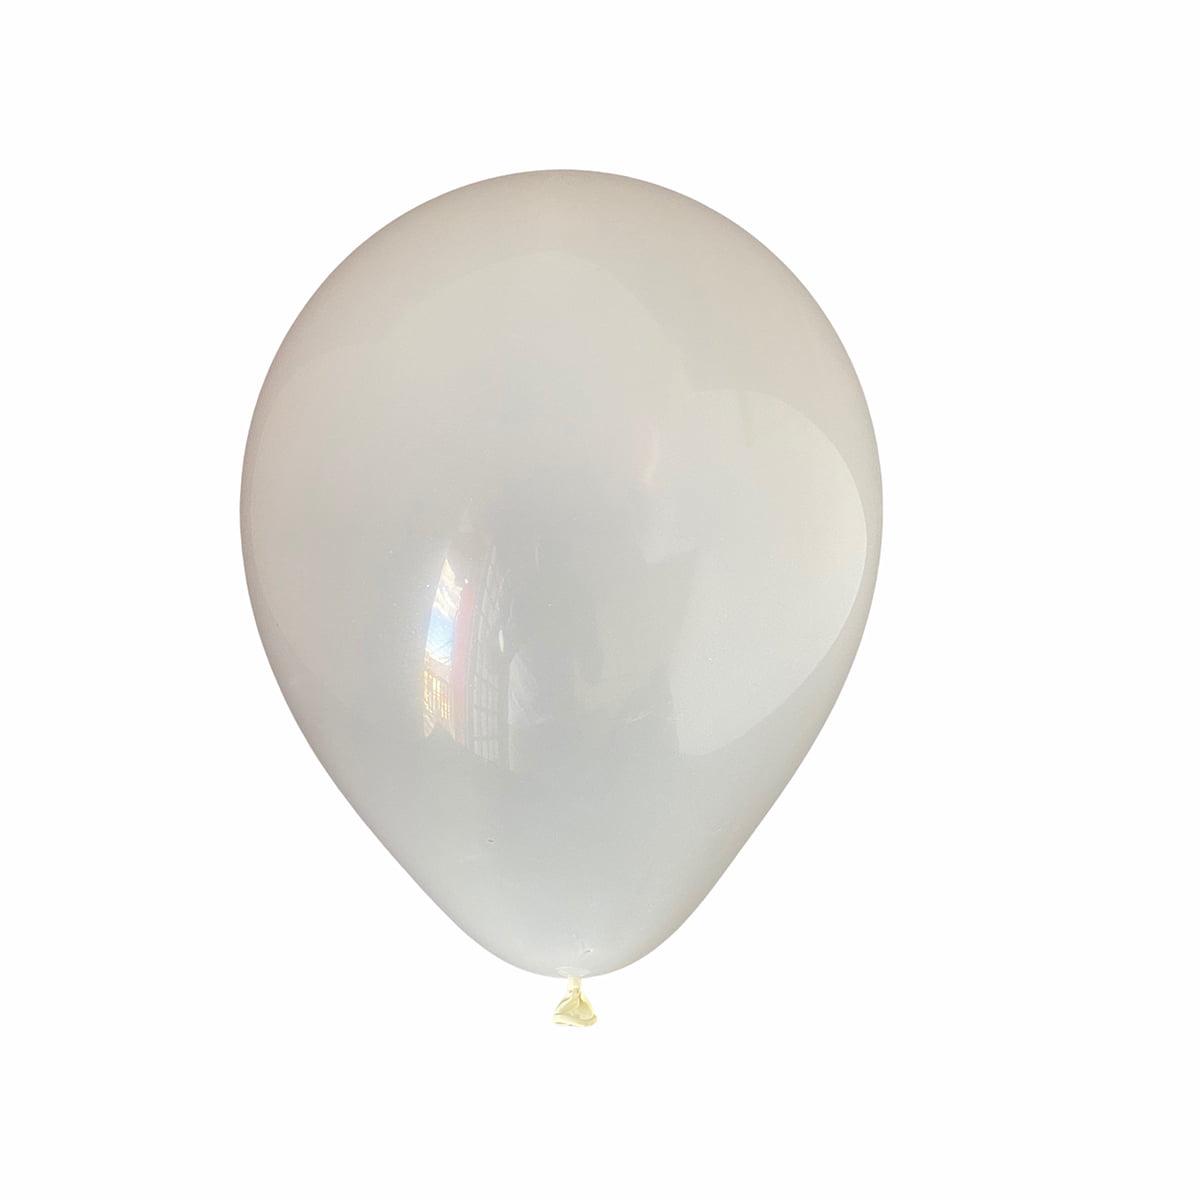 Balão Festball Liso Branco 9'' Polegadas - 50 unidades